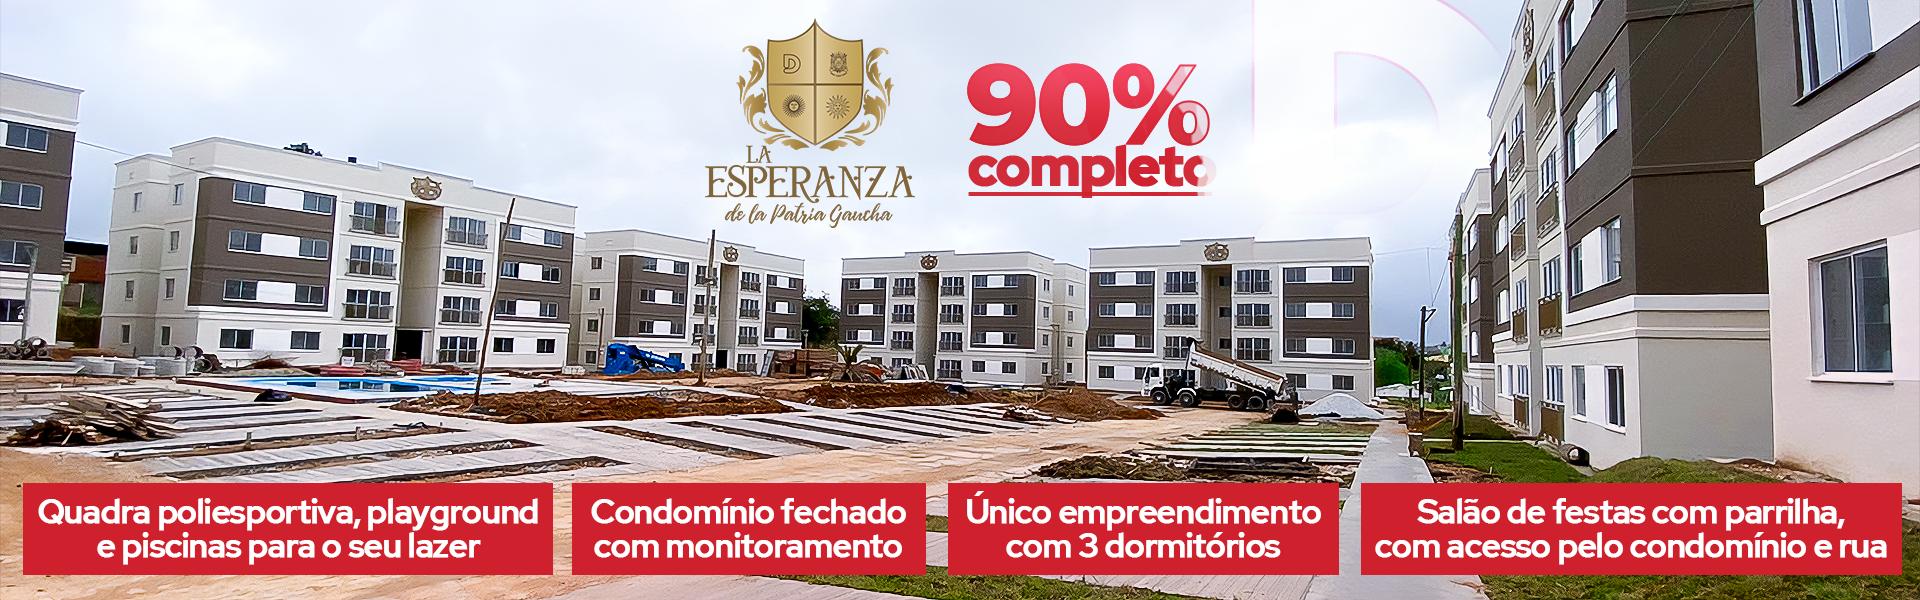 Dallé Construtora - La Esperanza